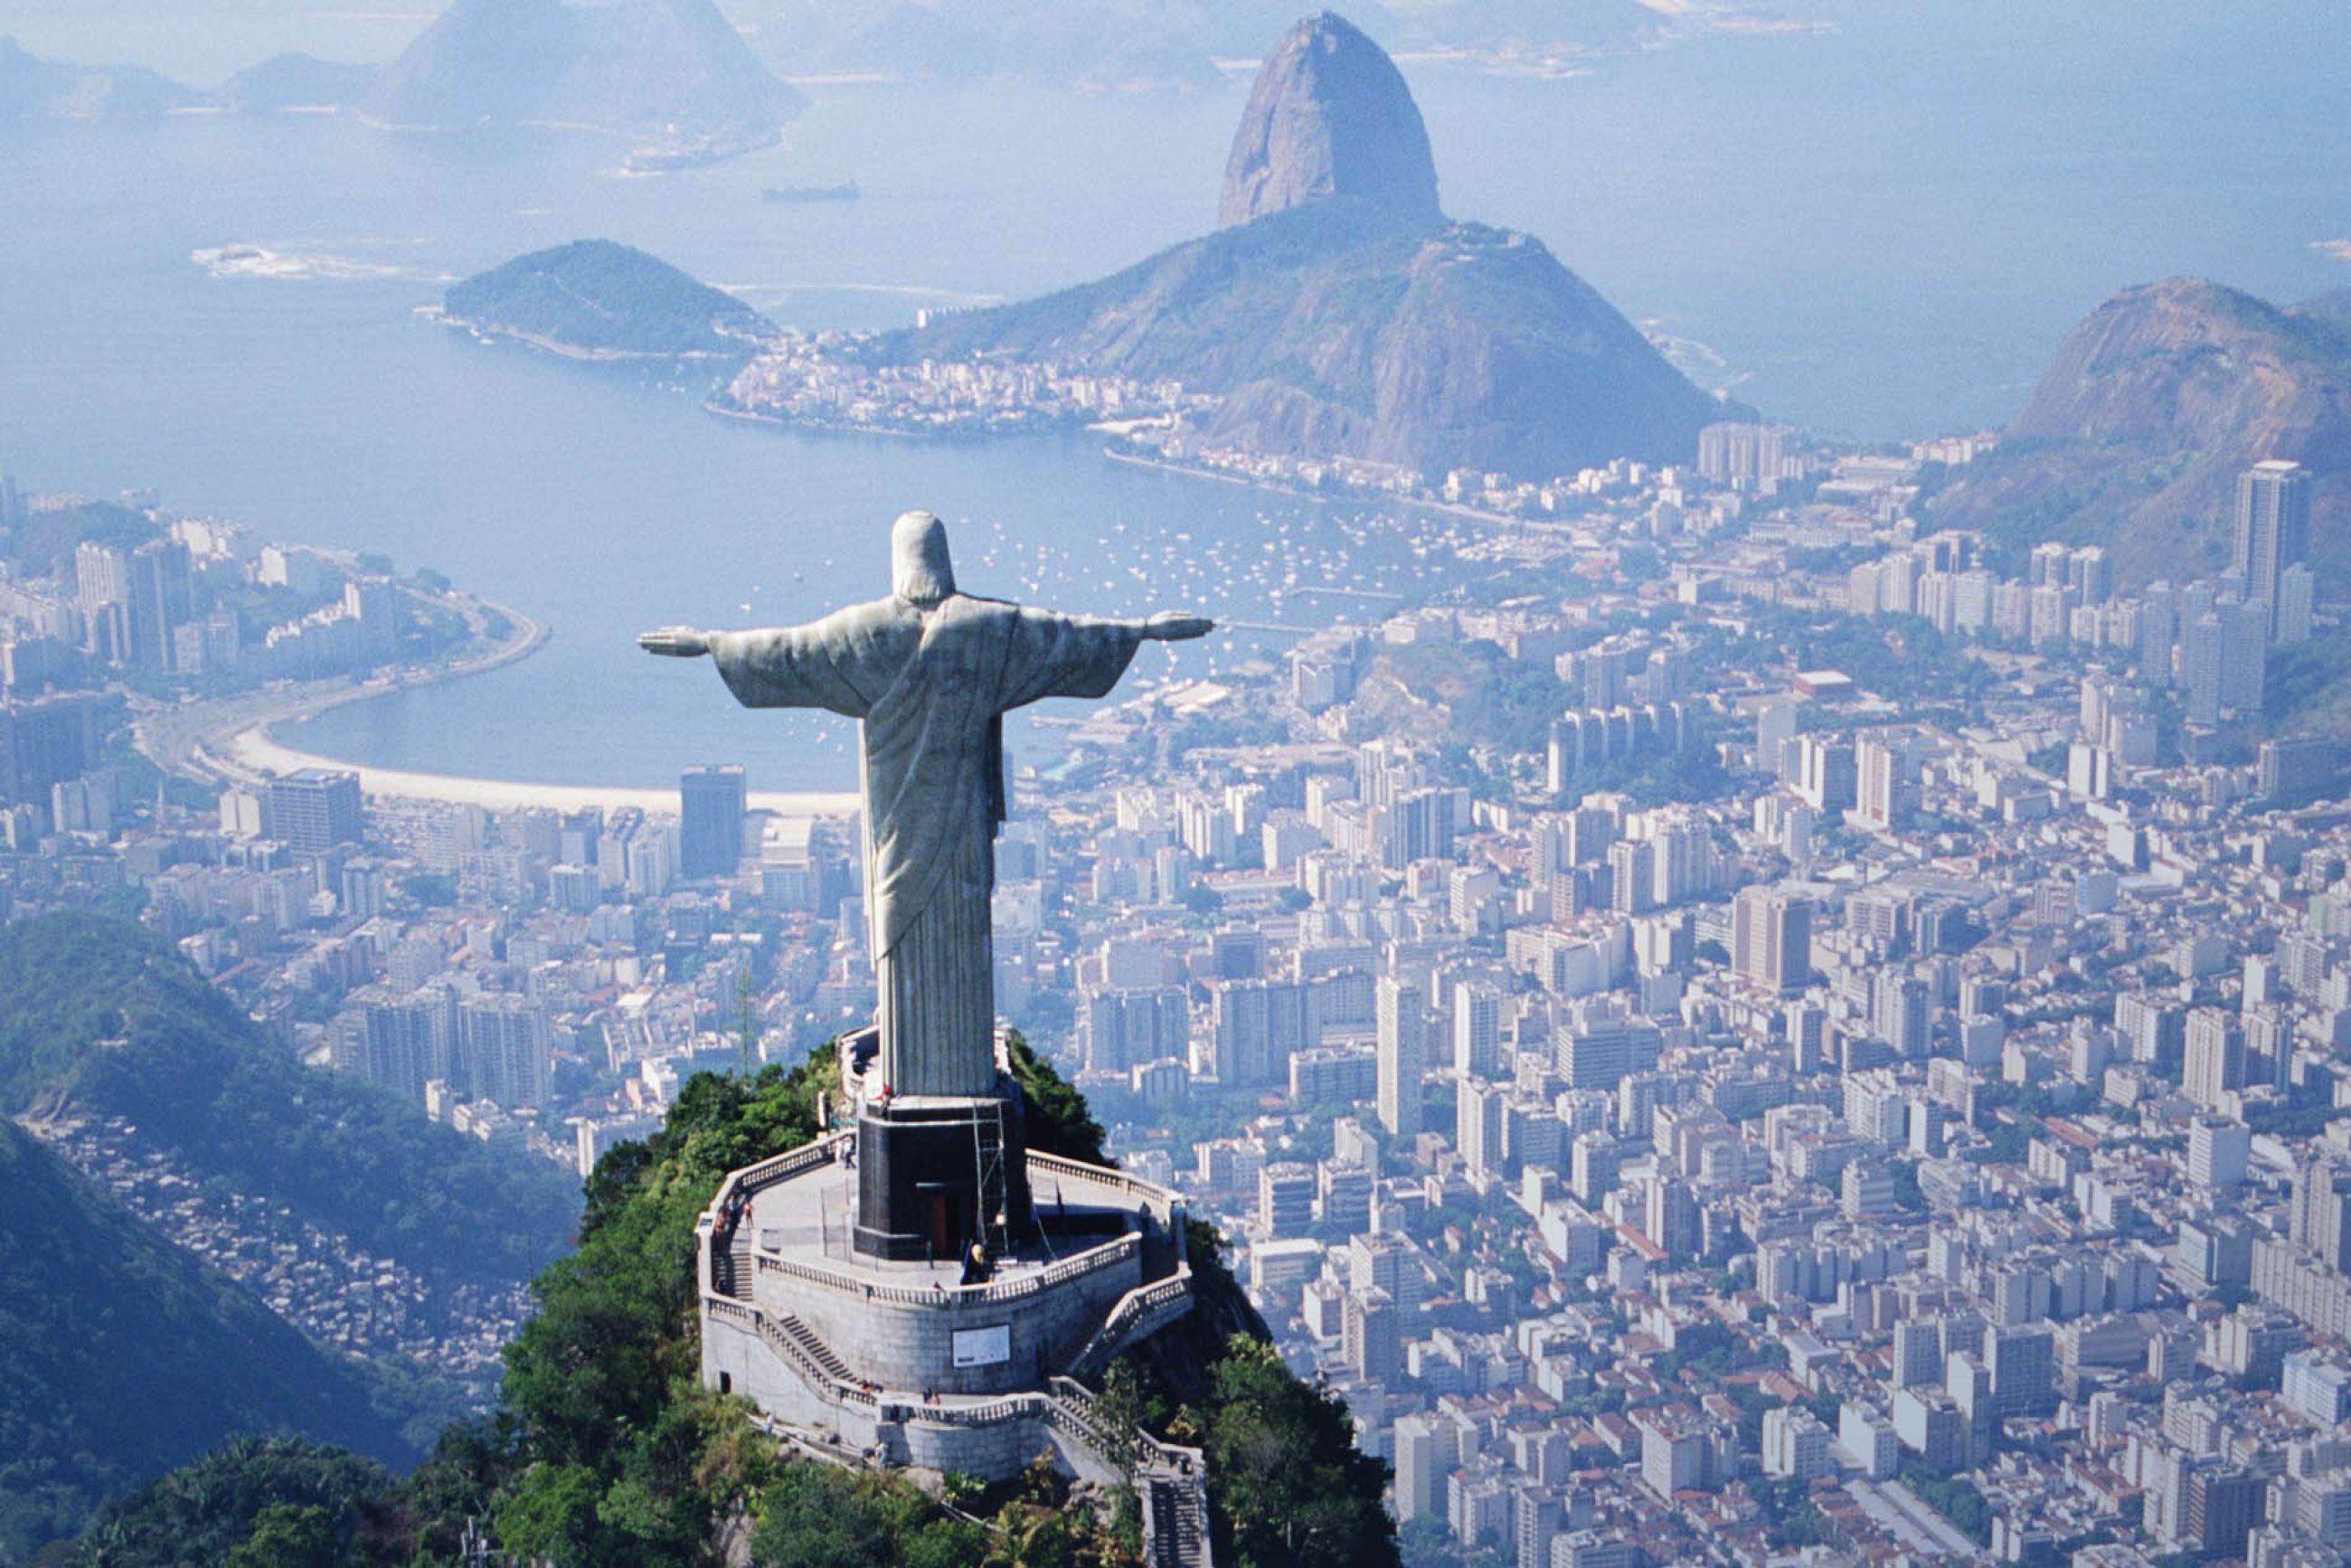 https://bubo.sk/uploads/galleries/5019/argentina-brazilia.jpg